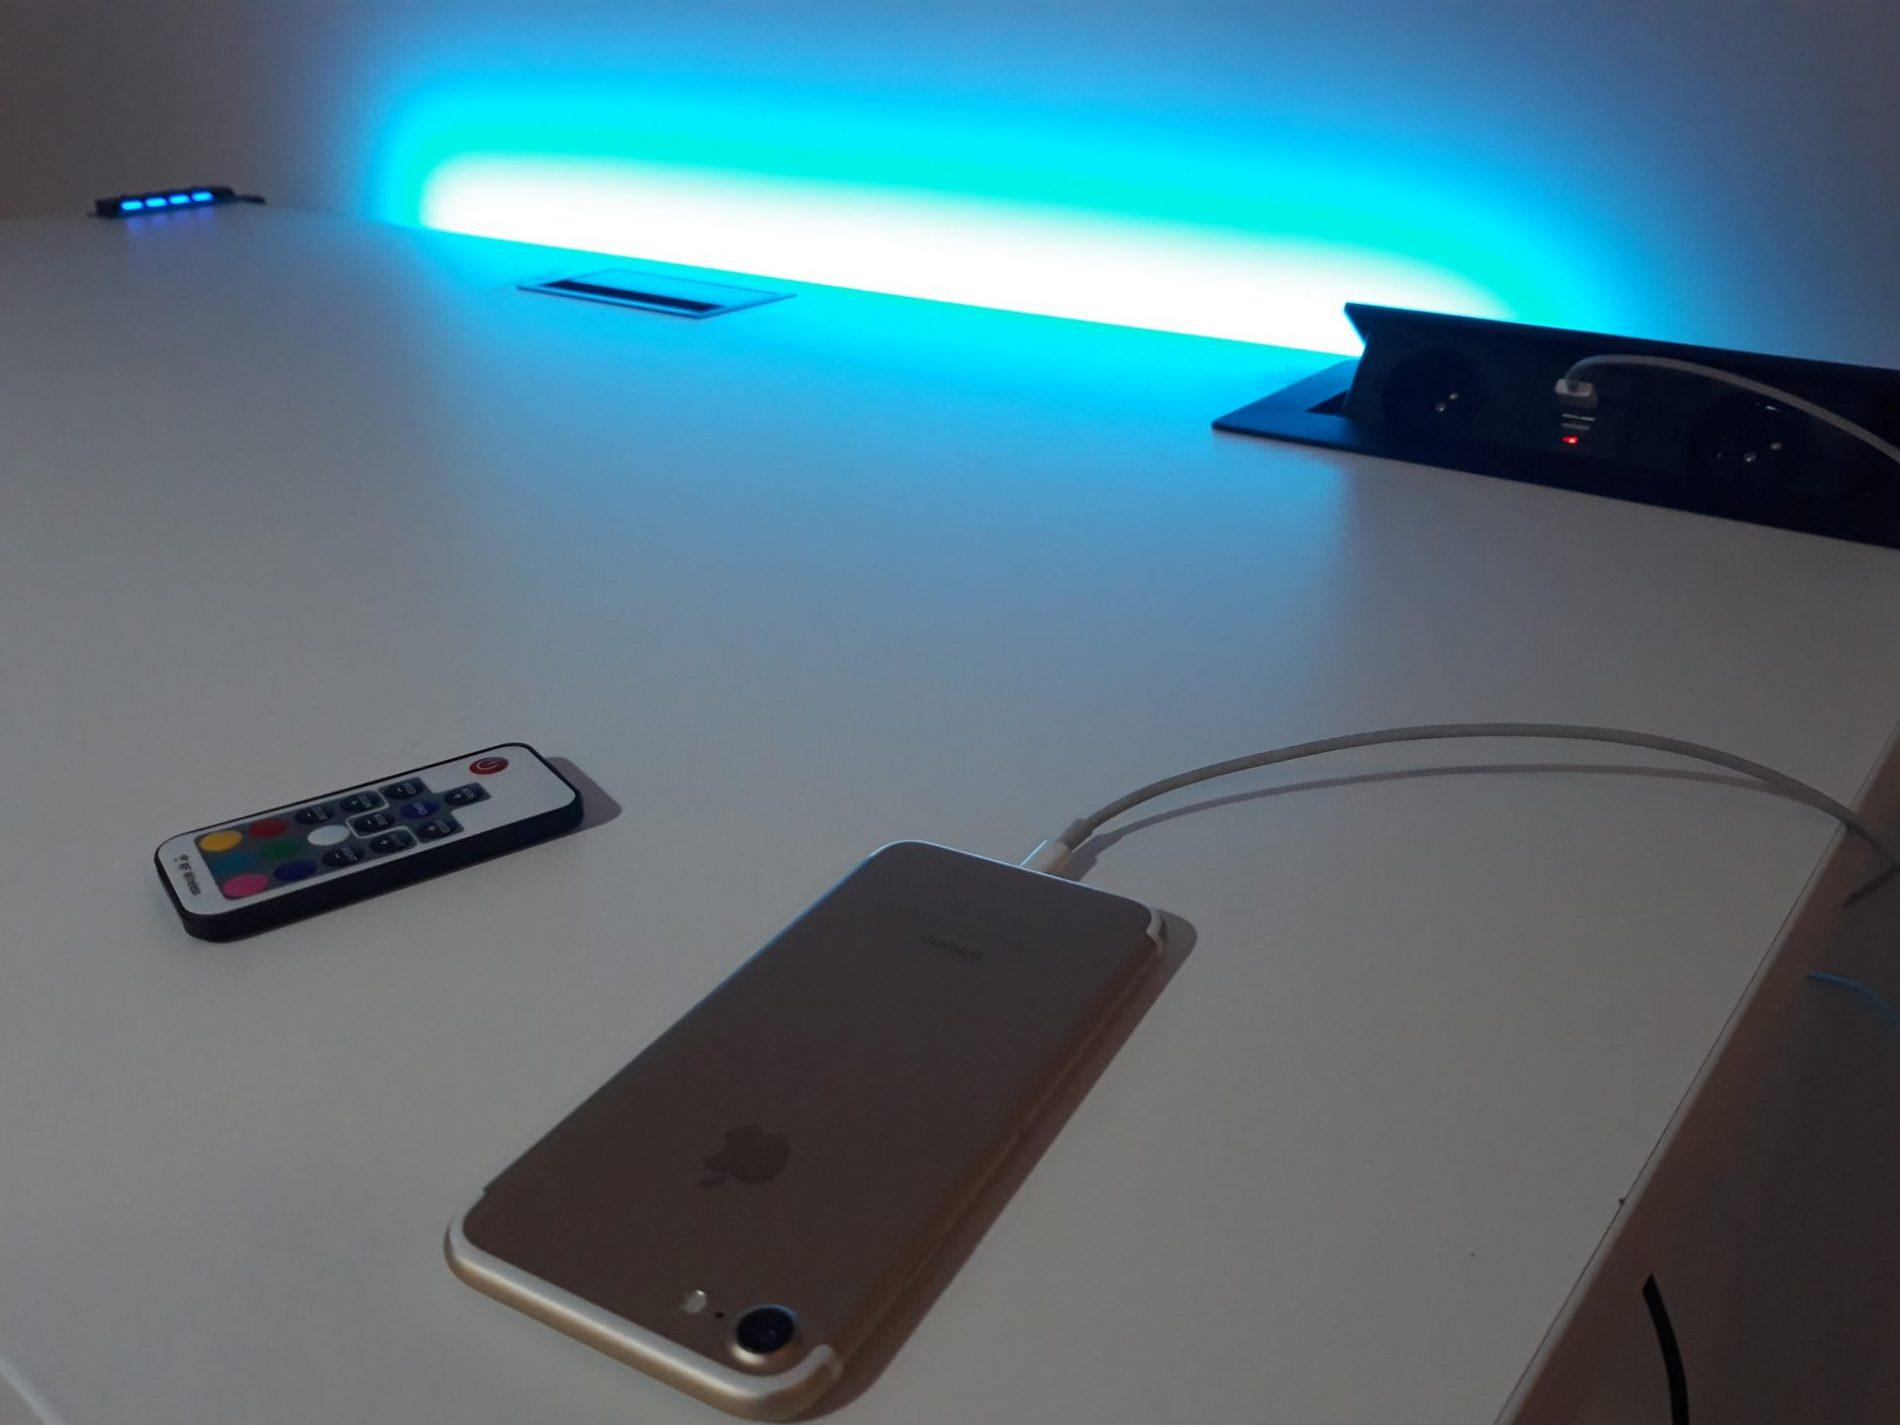 biurko gamingowe krl led komputerowe gniazdo usb